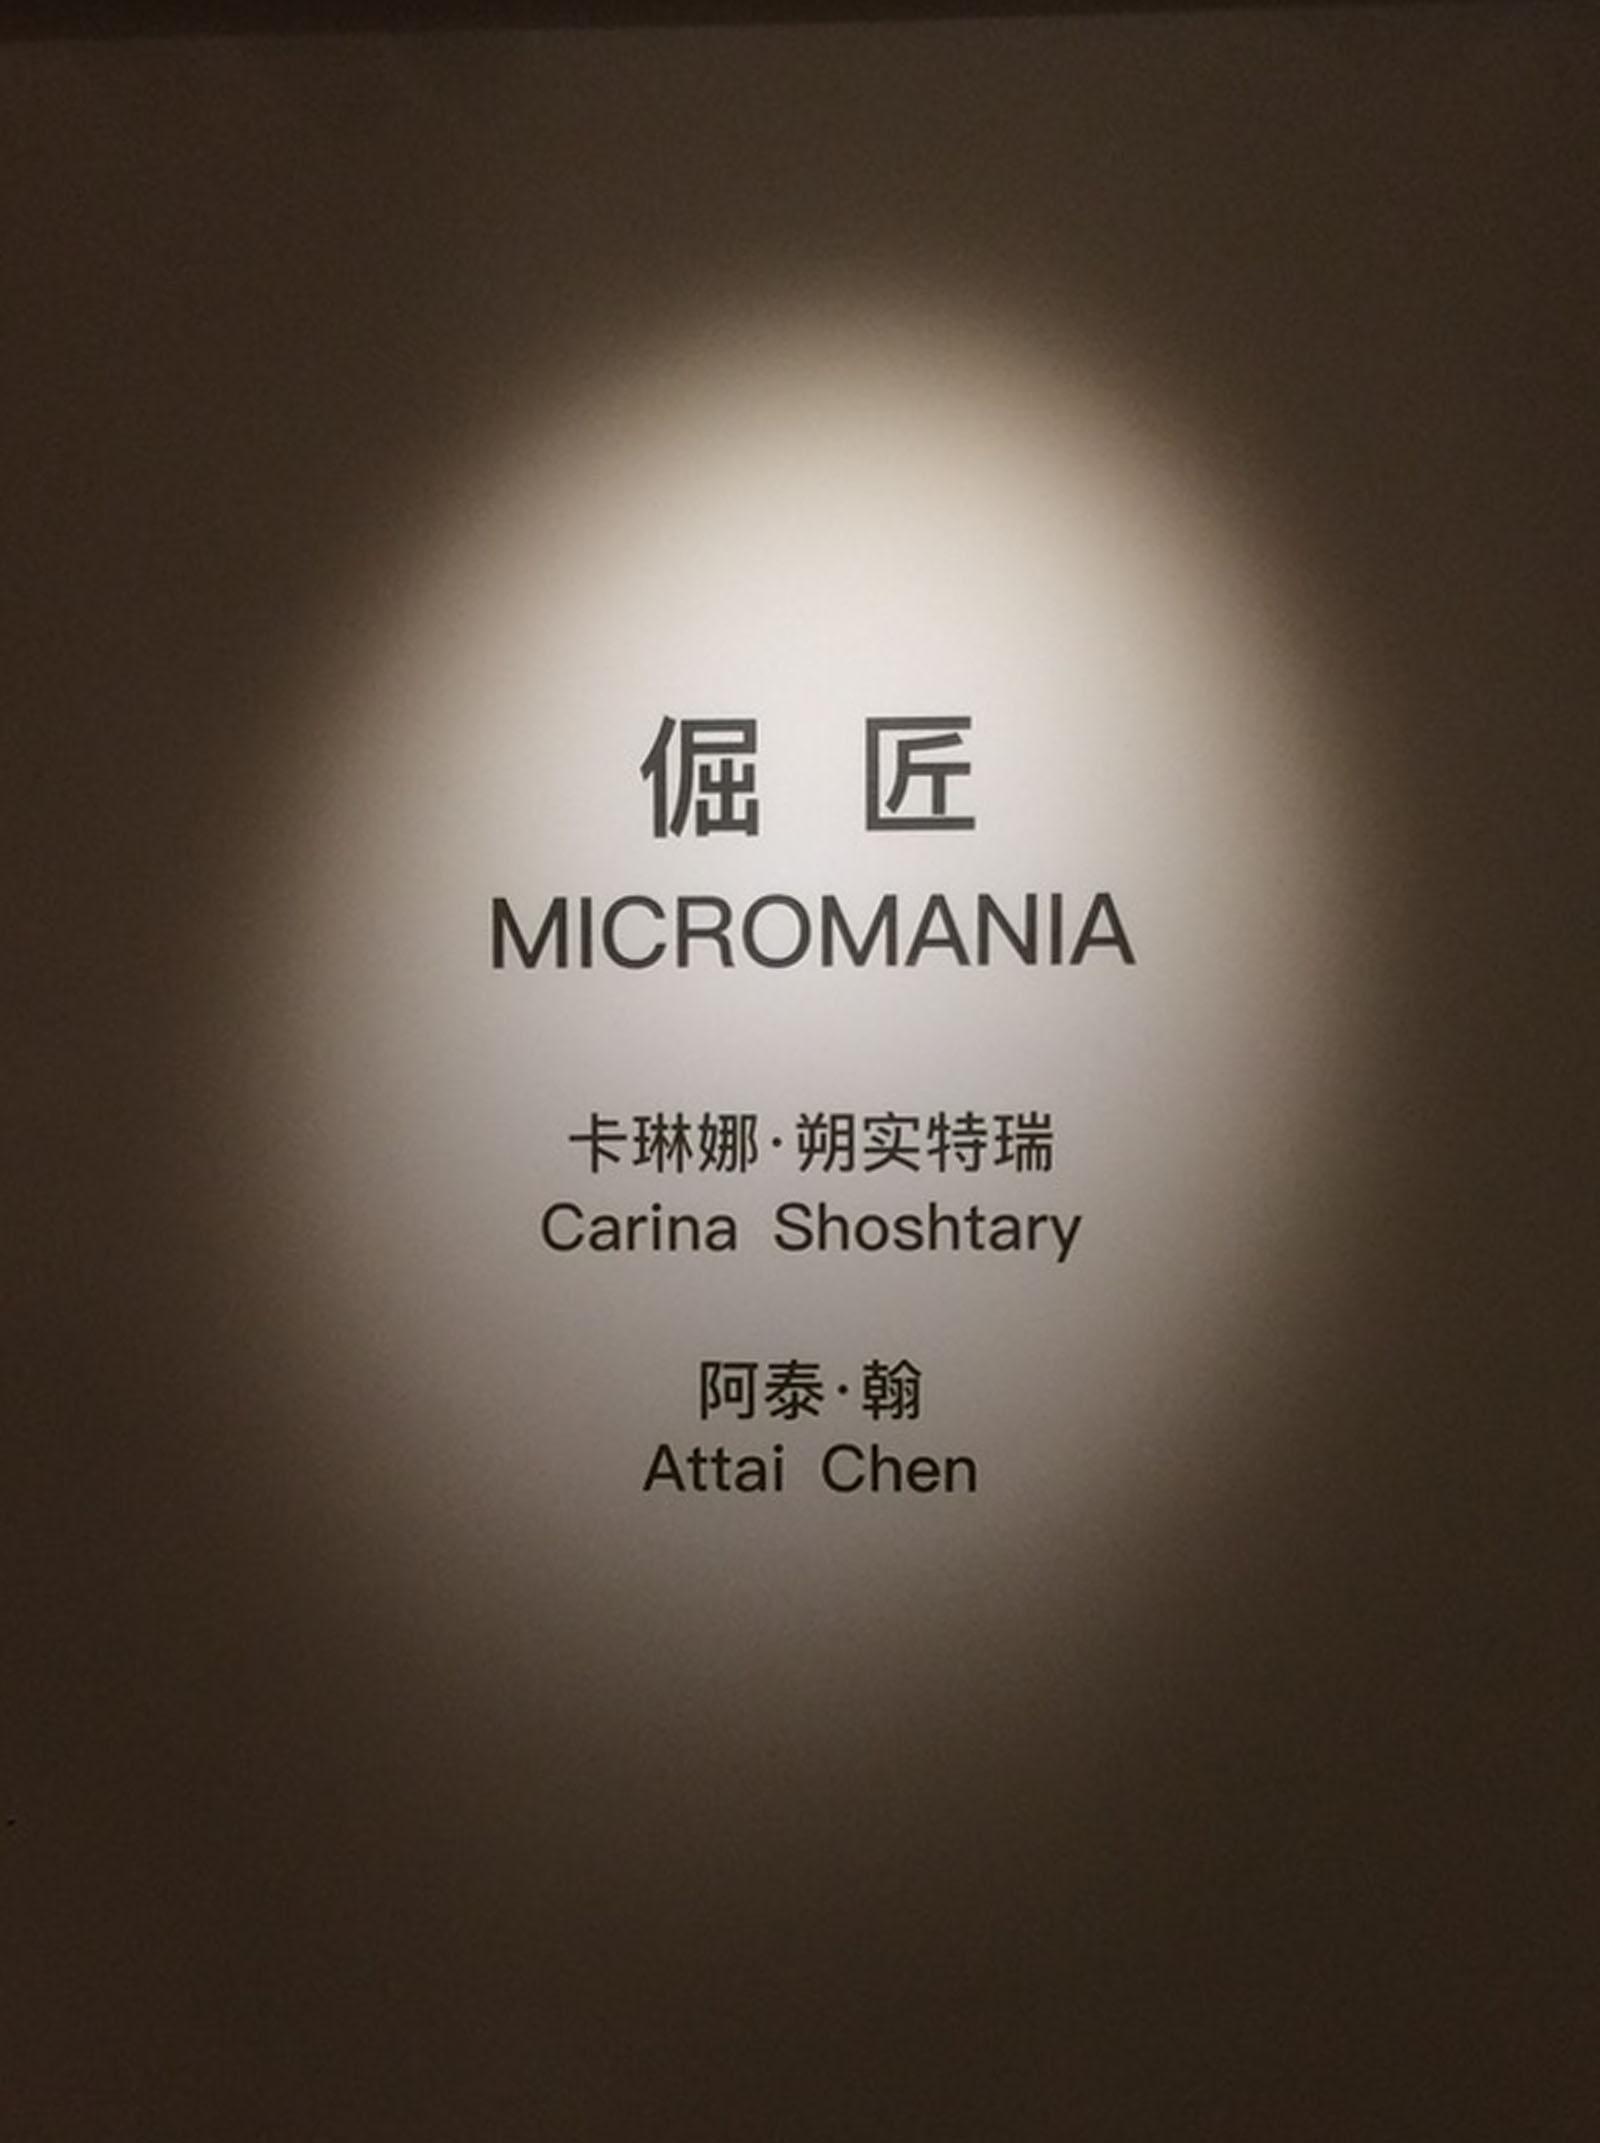 """Micromania"" I A duo show of Attai Chen and Carina Shoshtary I 2017/2018 I Froots & Nogart, Shanghai, China I Photo: Froots"